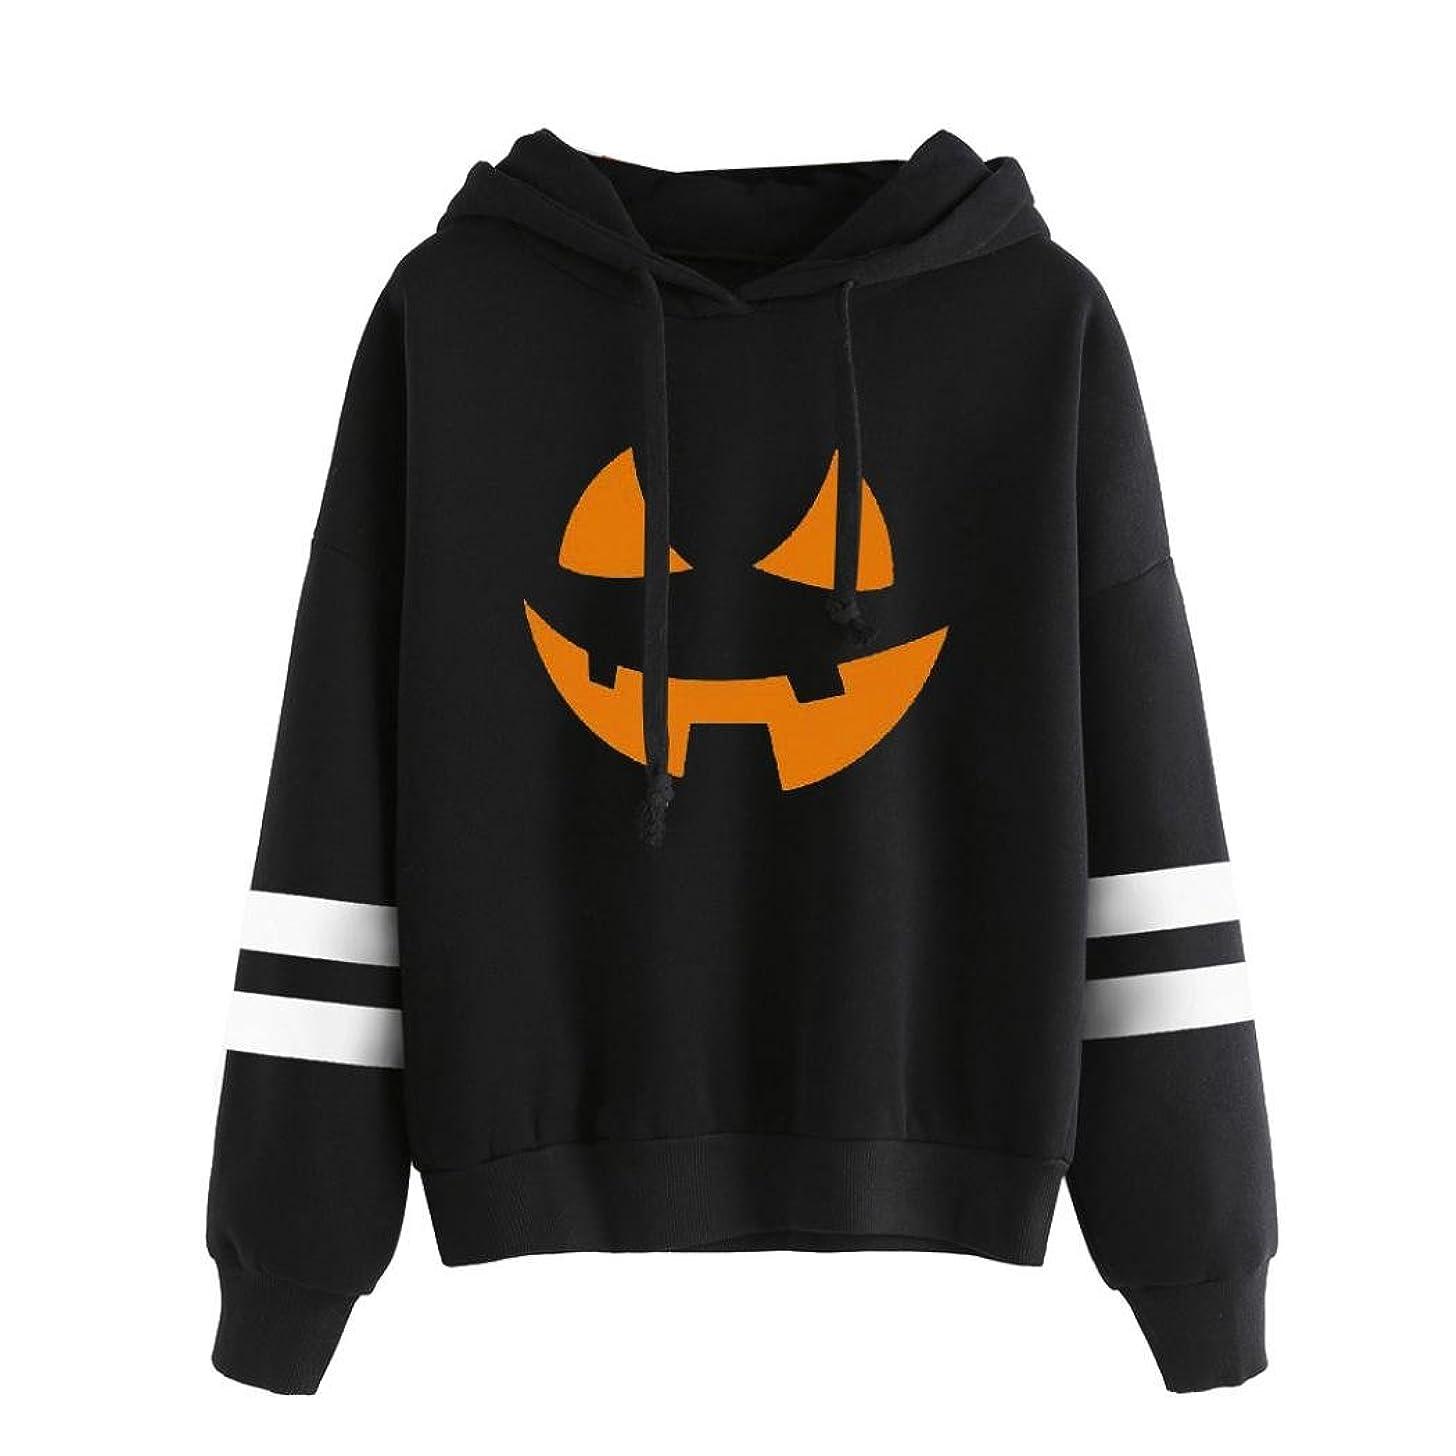 Keepfit Women Halloween Pumpkin Hoodie Sweatshirt Jumper Crewneck Pullover Tops Blouse